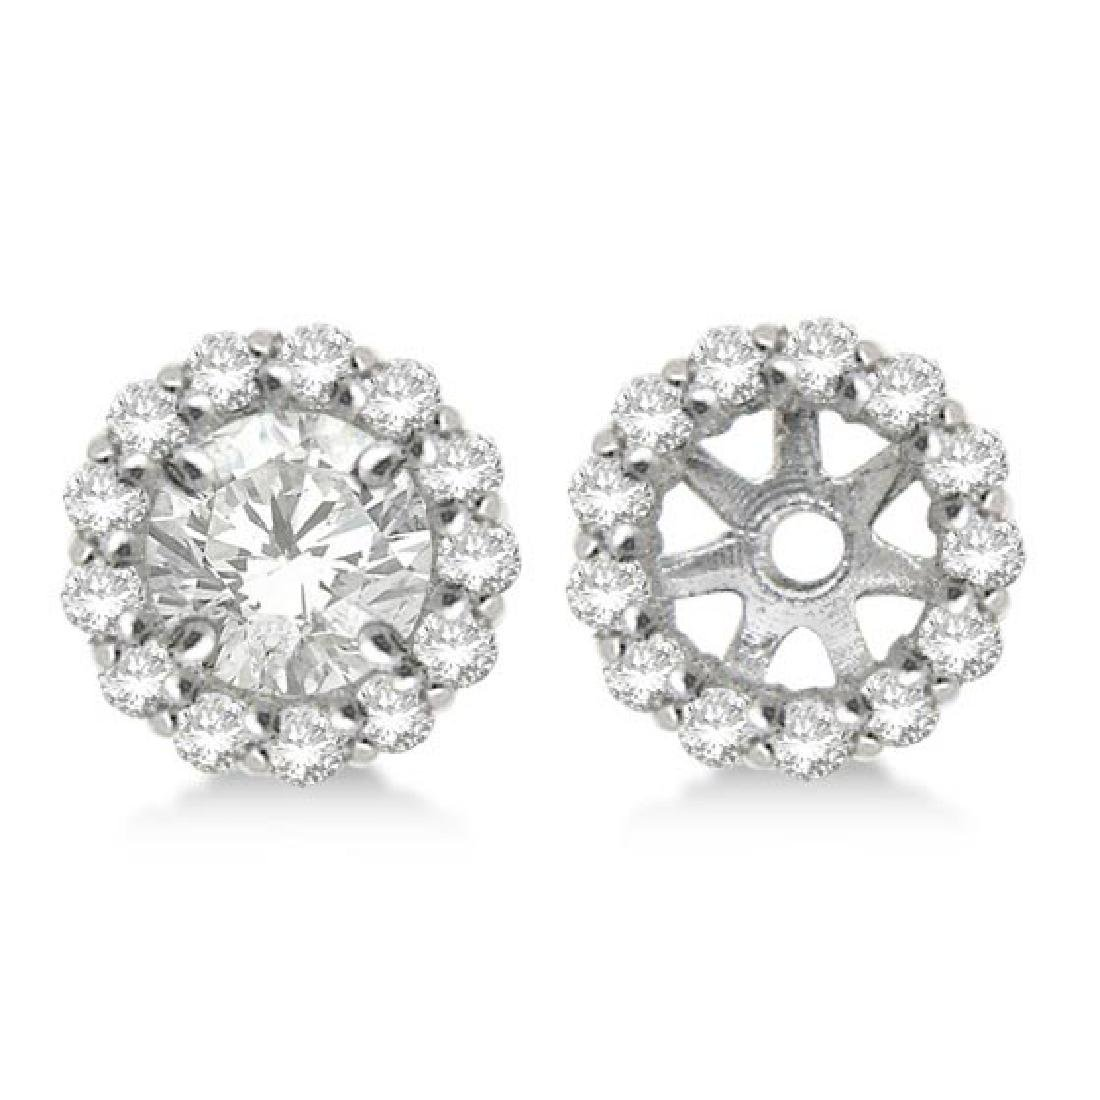 Round Diamond Earring Jackets for 5mm Studs 14K White G